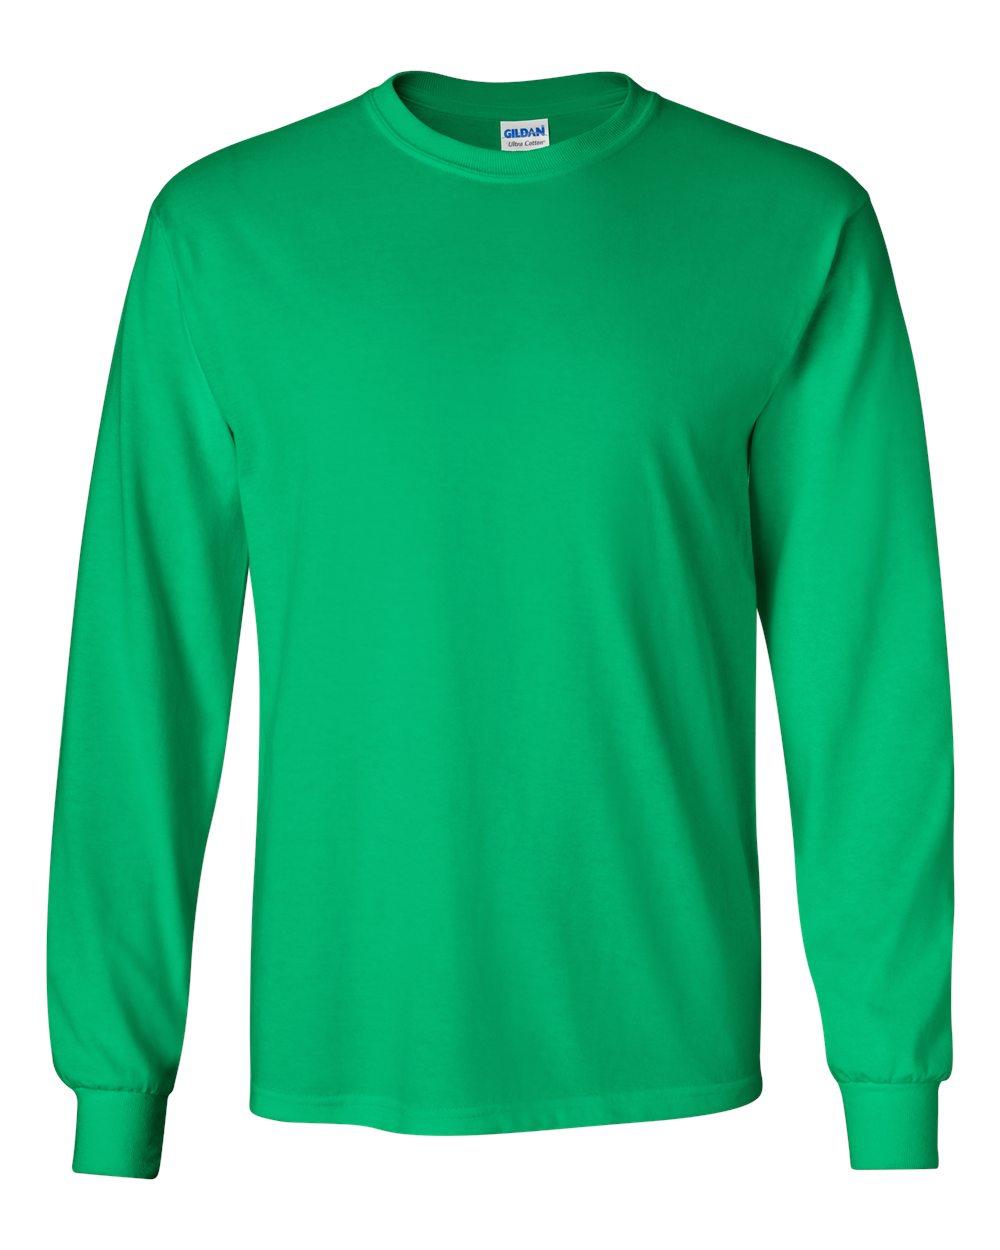 5de63ff502c4 Plain Long Sleeve Shirts Mens